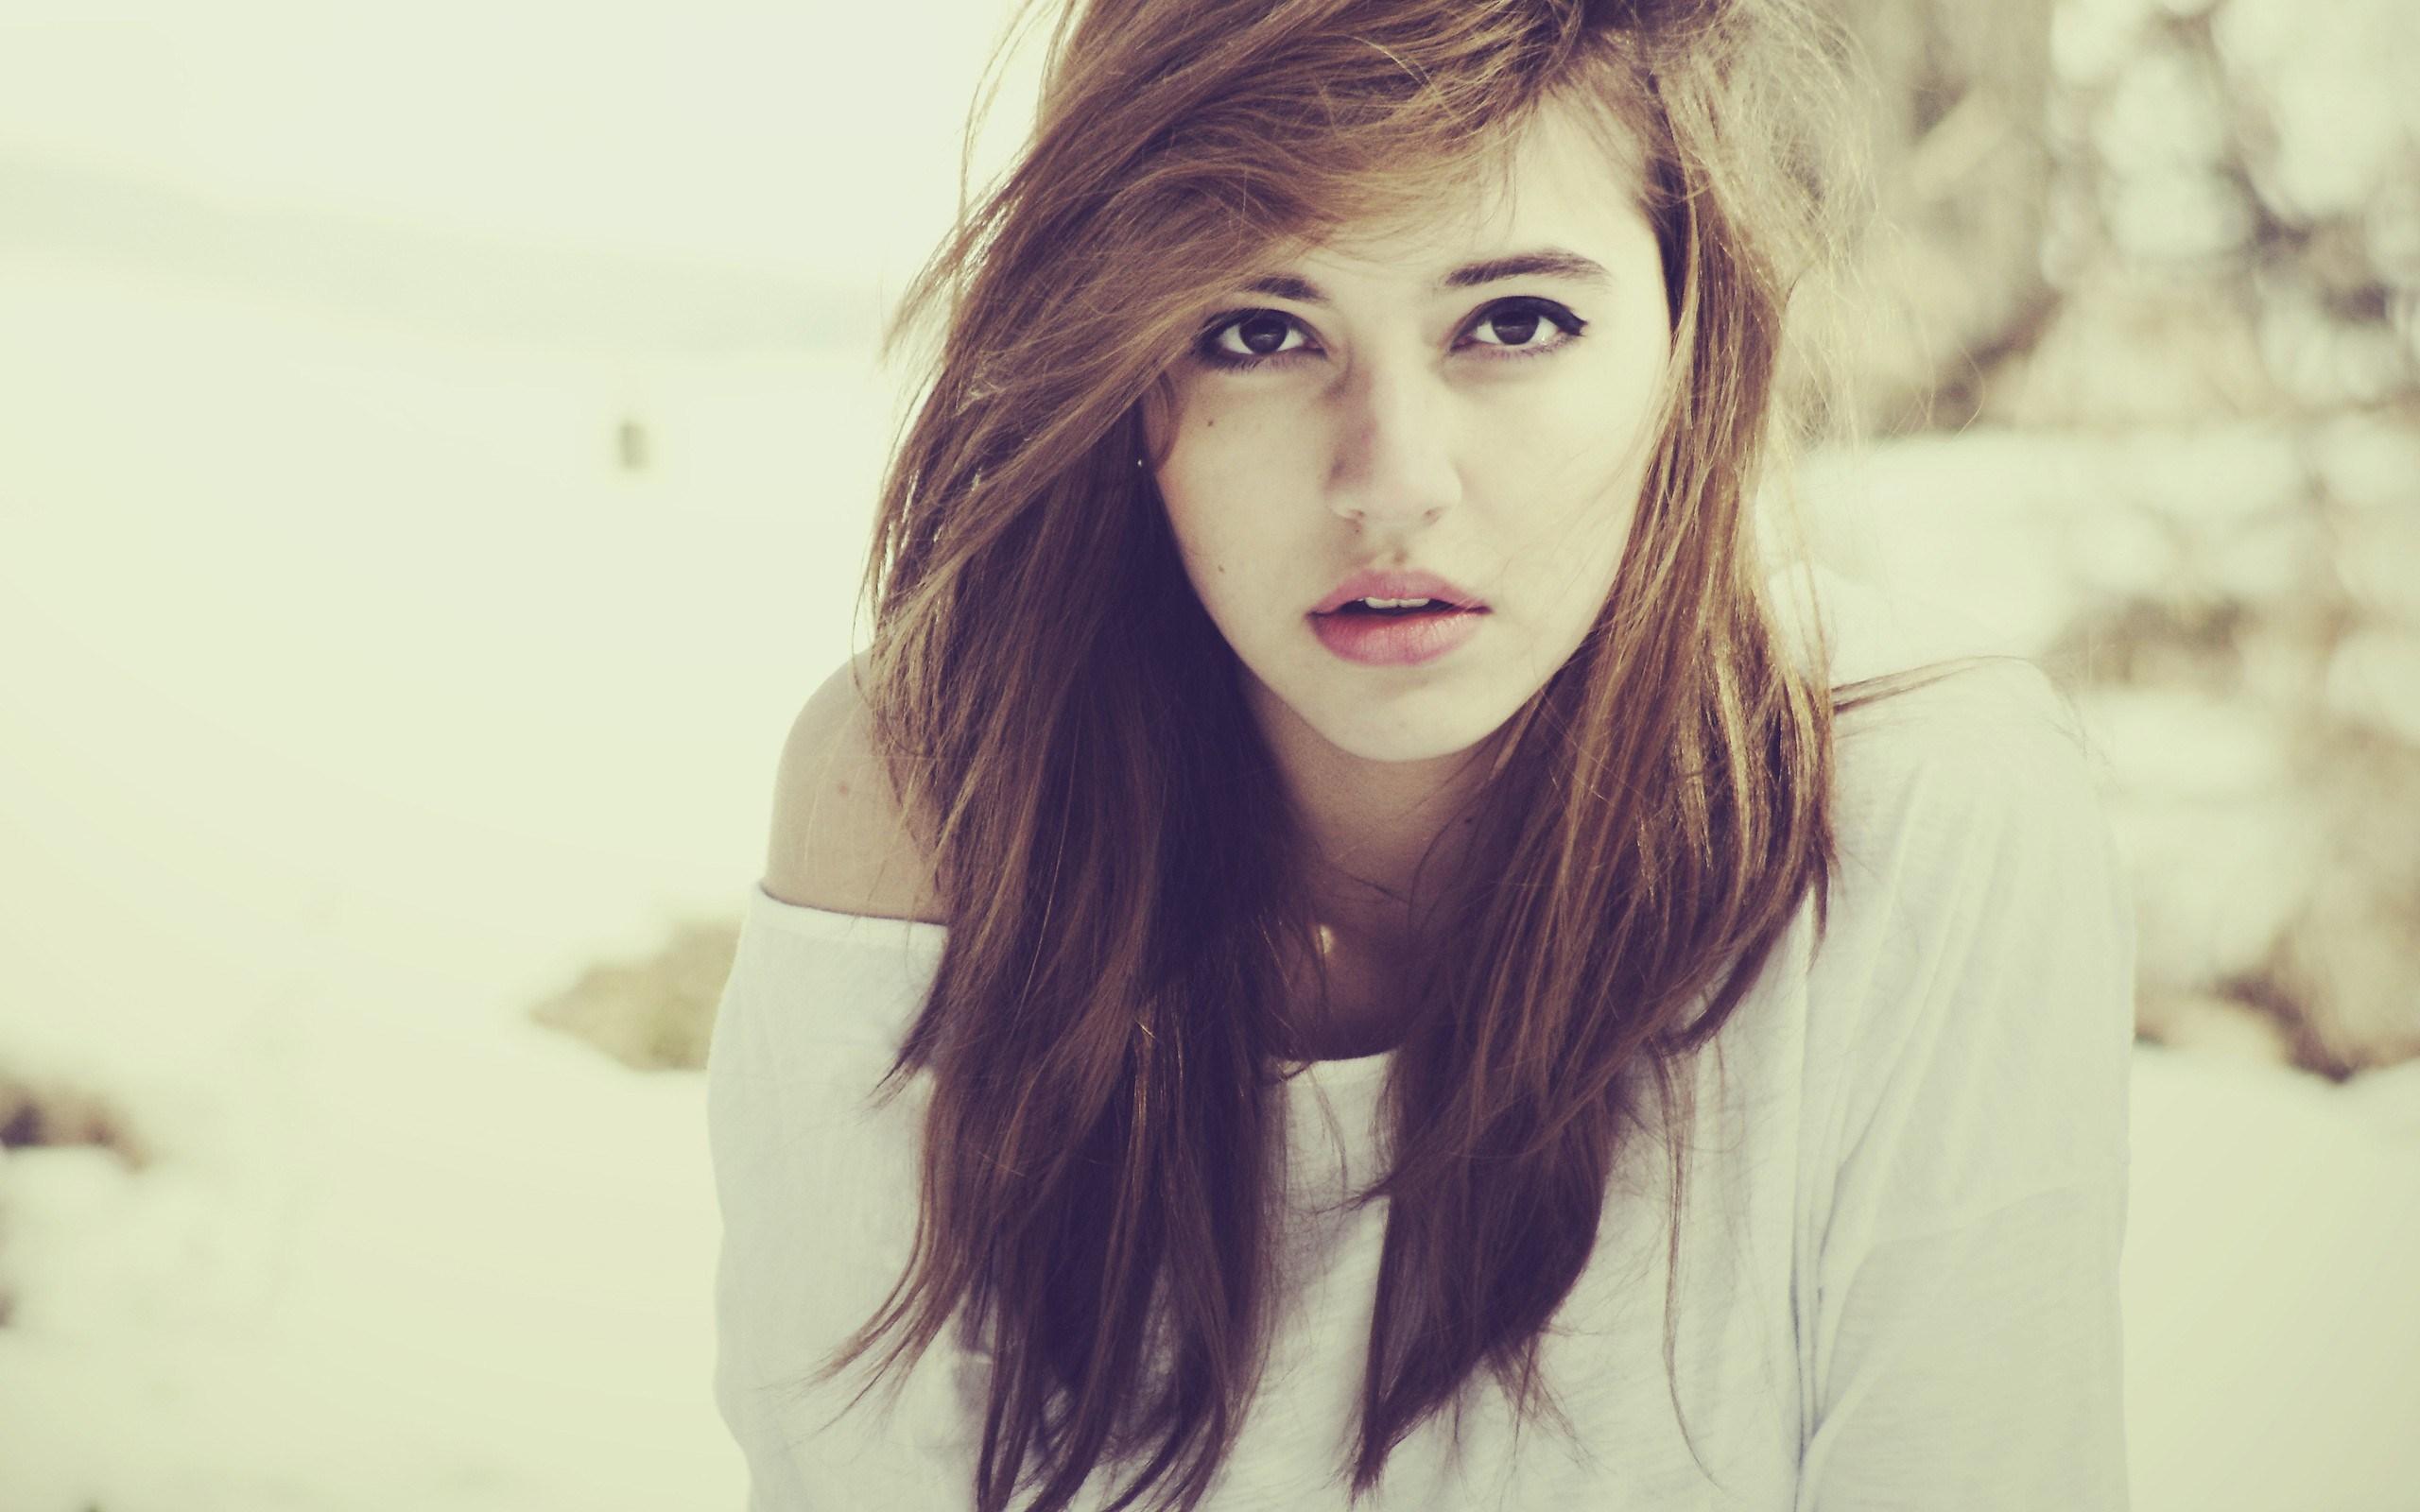 Cute Girl Photography